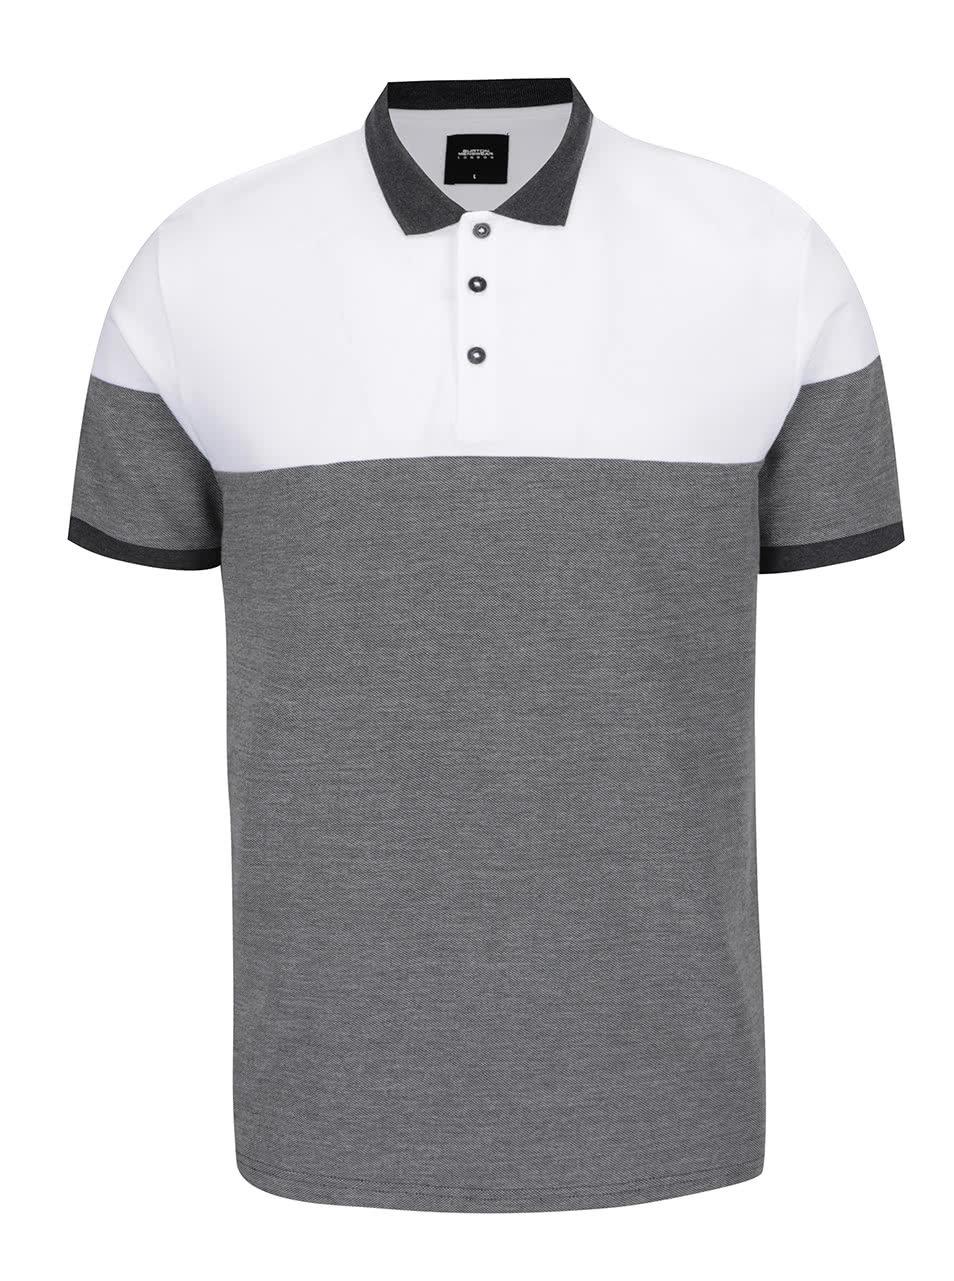 ec601f2c8c54 Bielo-sivá pánska polokošeľa Burton Menswear London ...